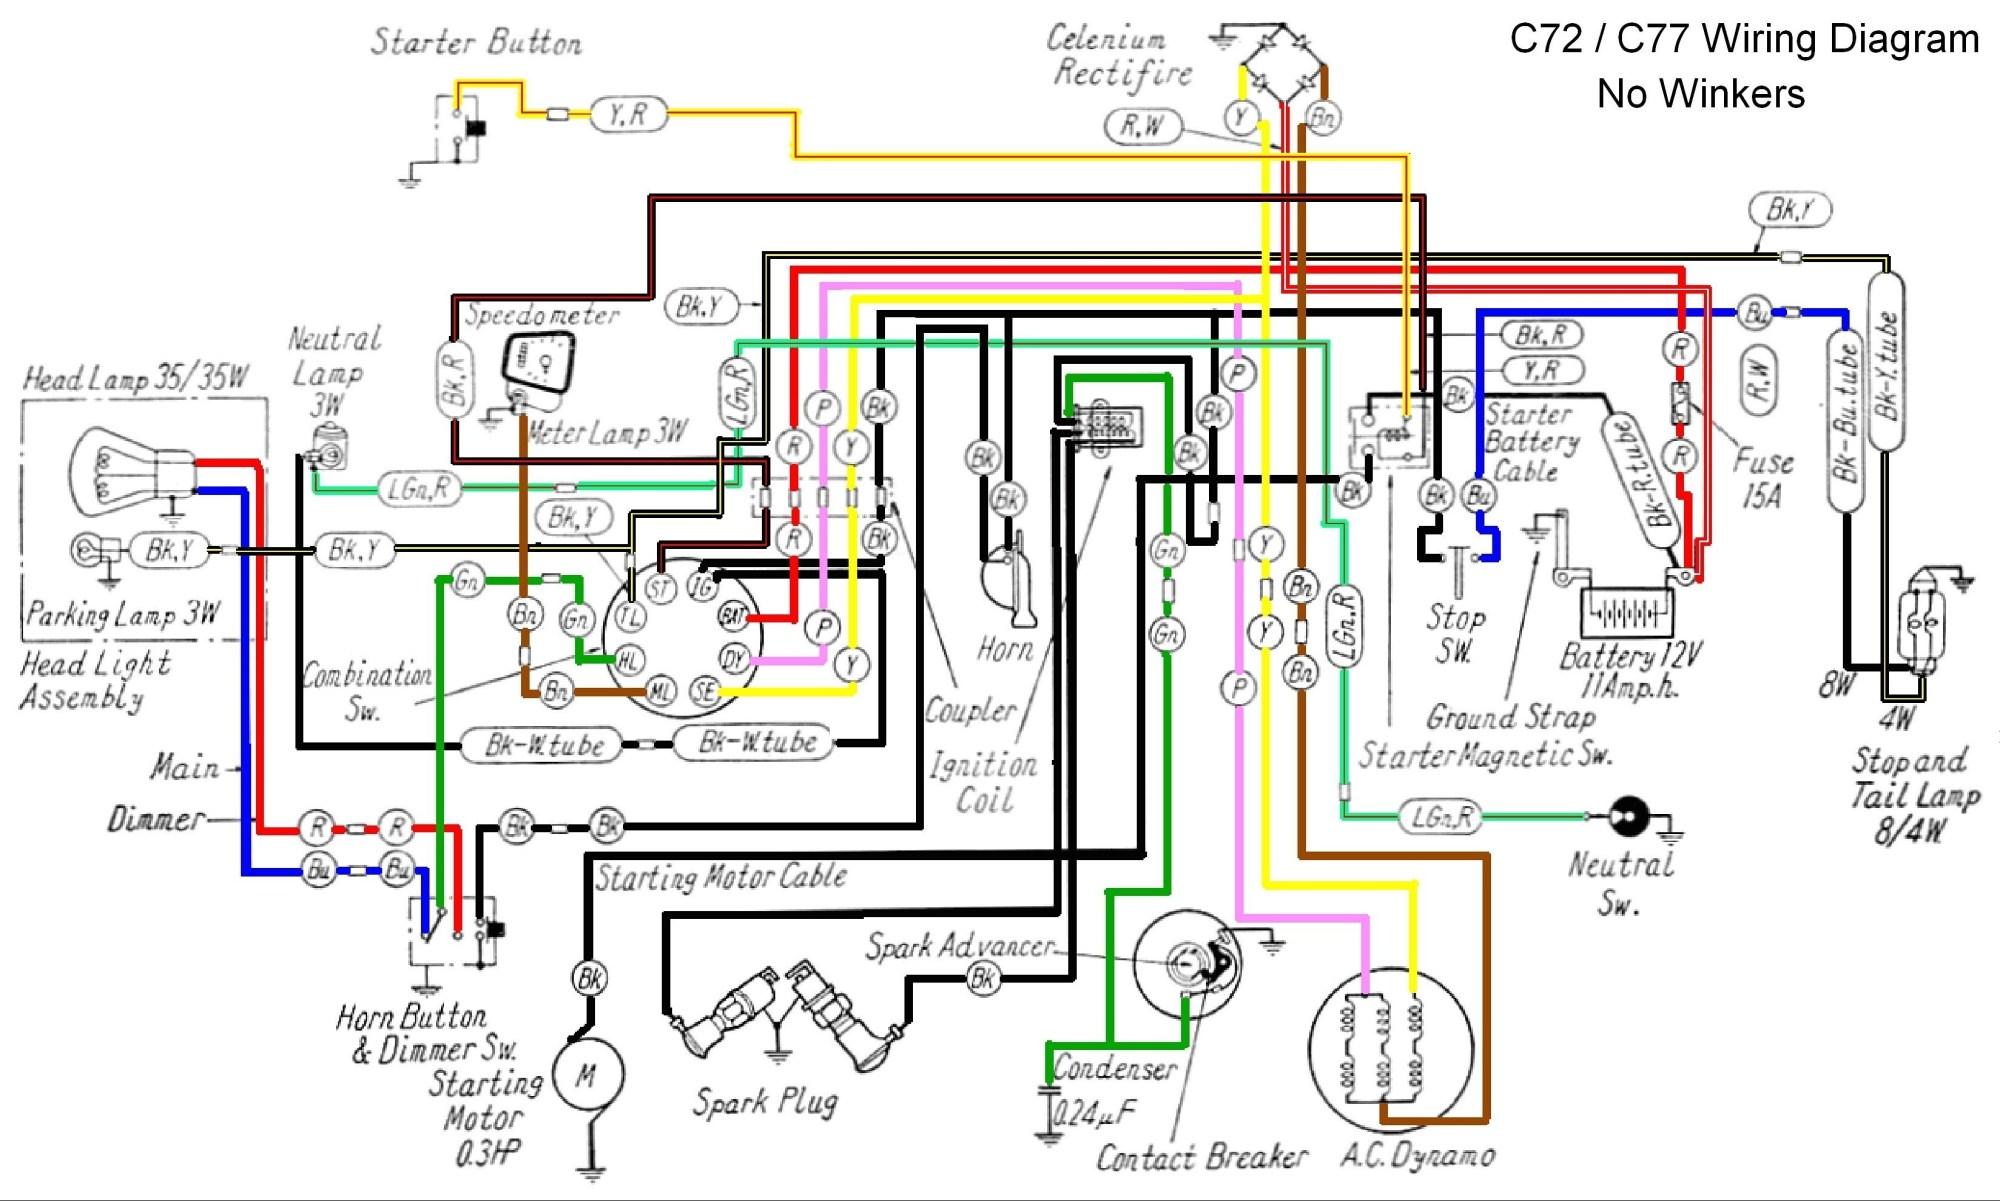 hight resolution of honda 919 wiring diagram wiring diagram operations 919 honda fuse box location